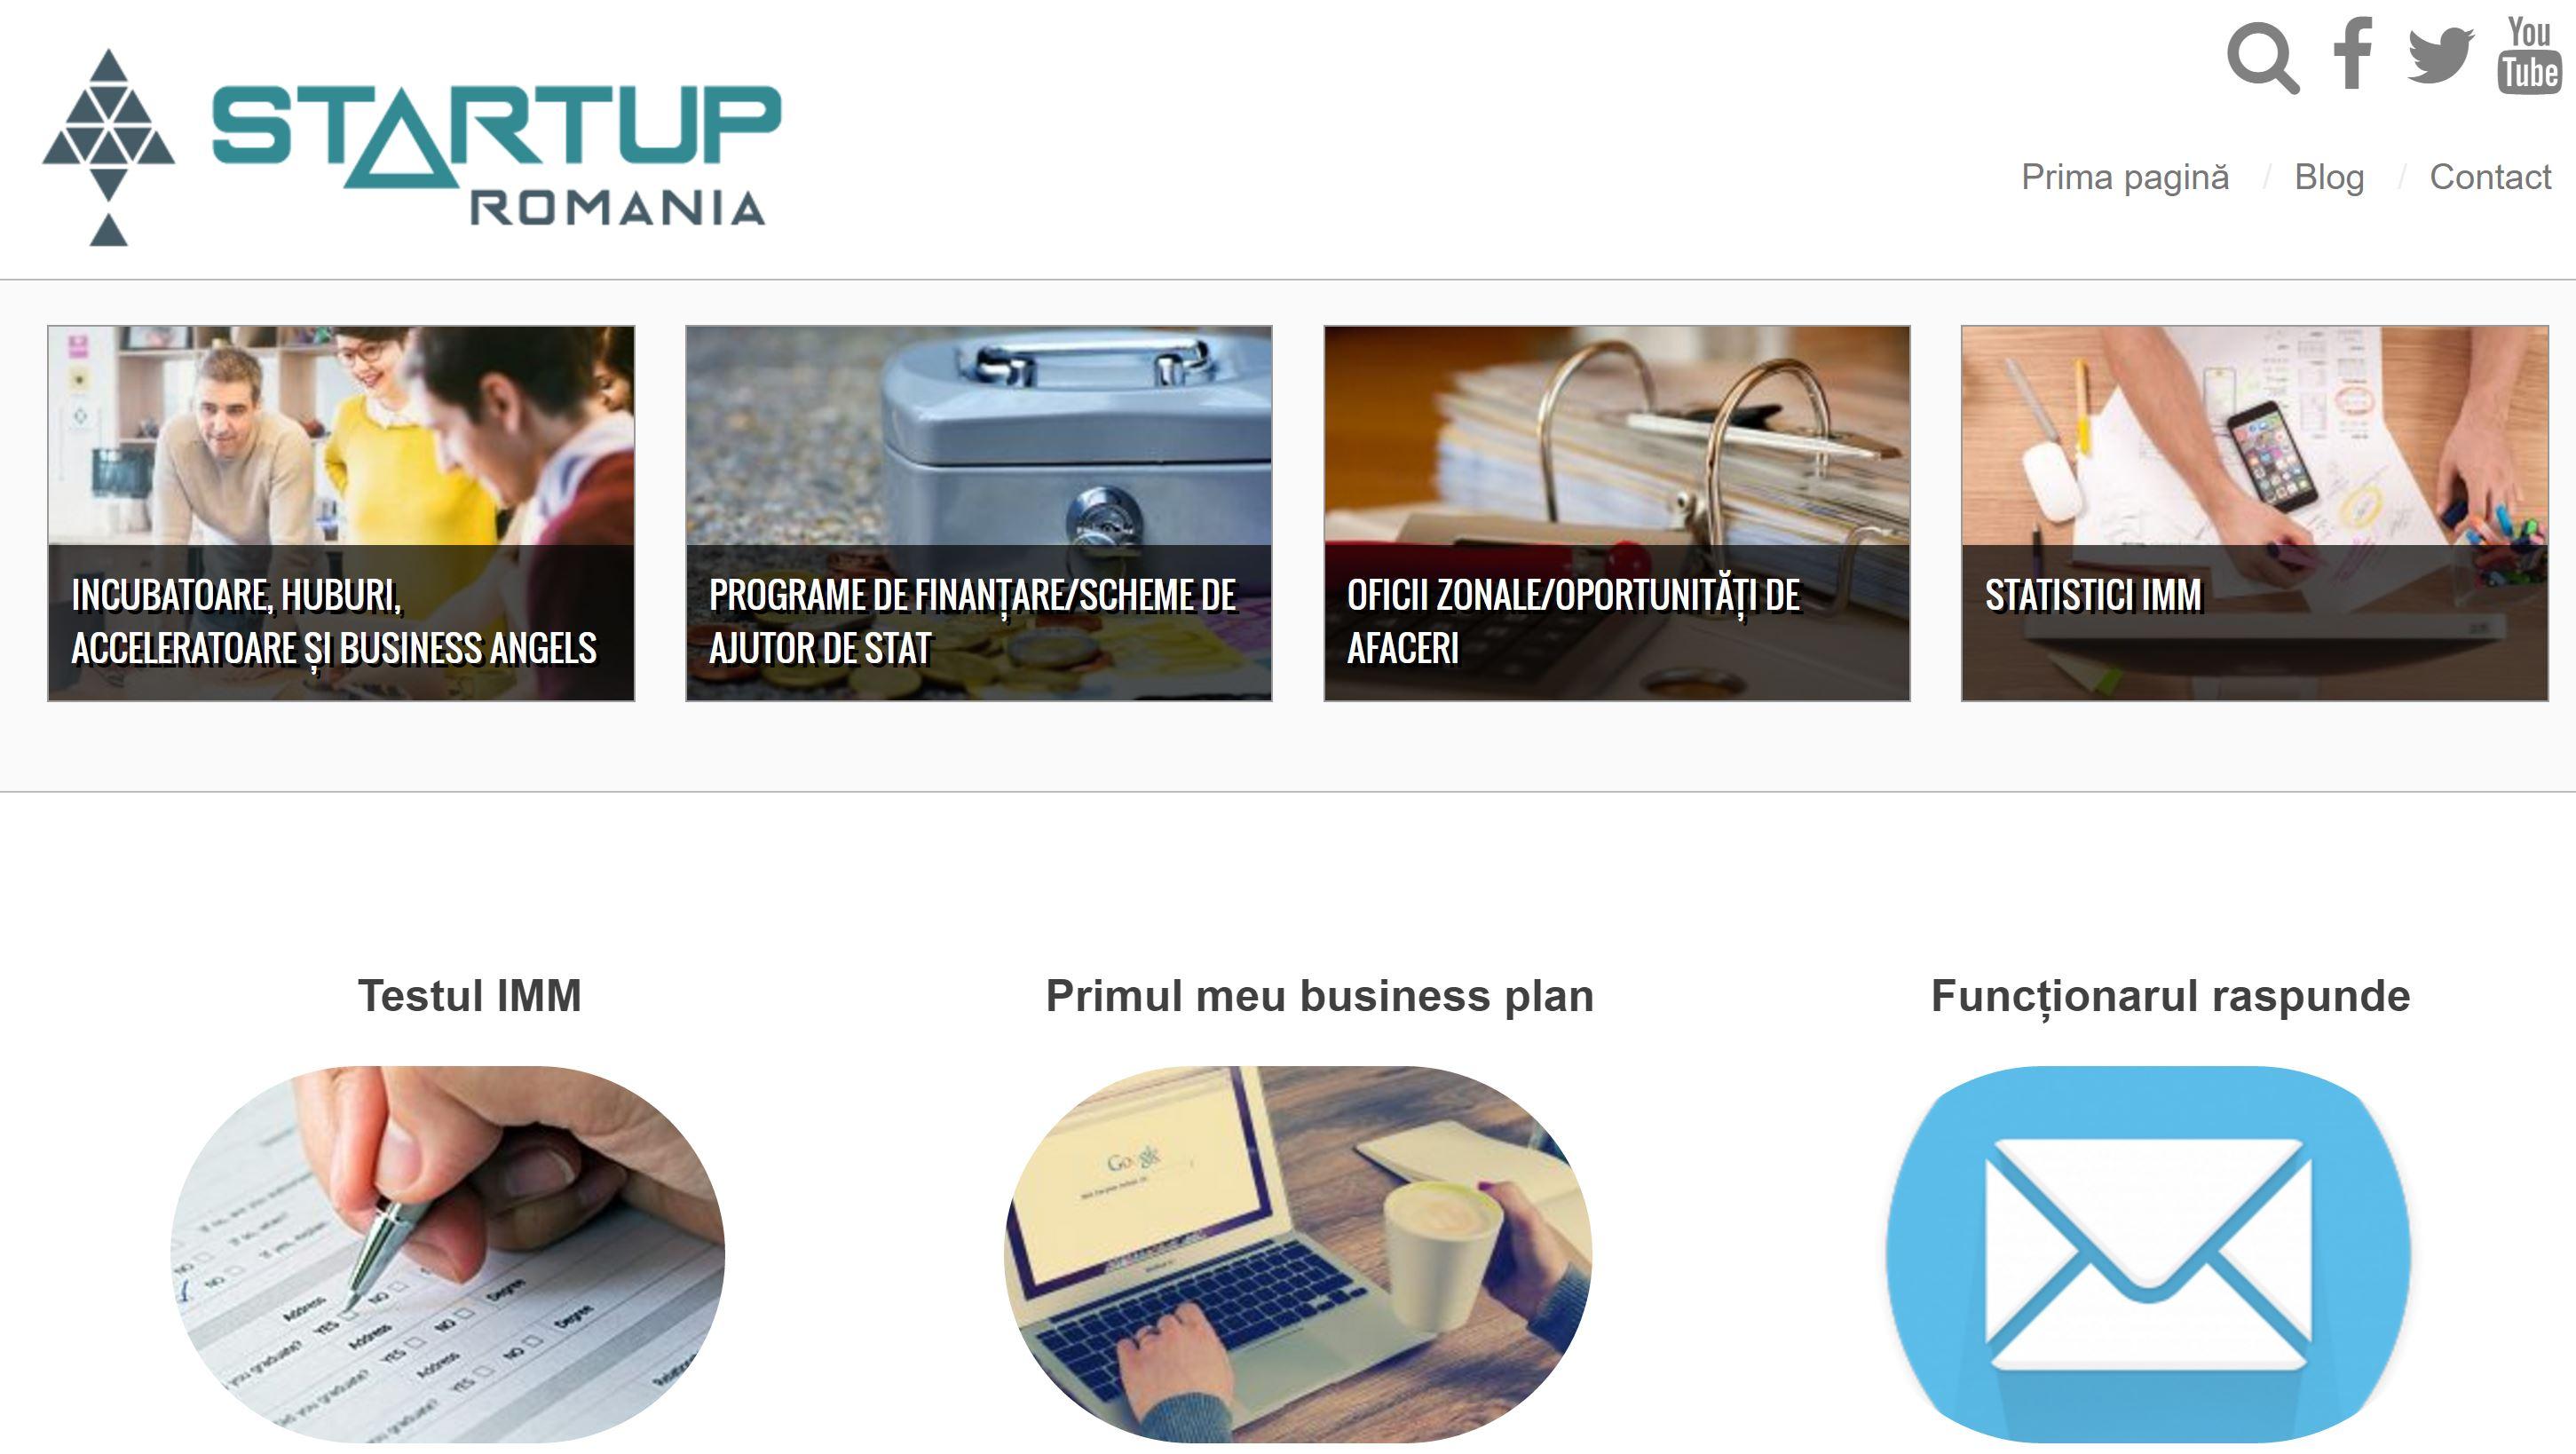 Antreprenoriat antreprenor startup